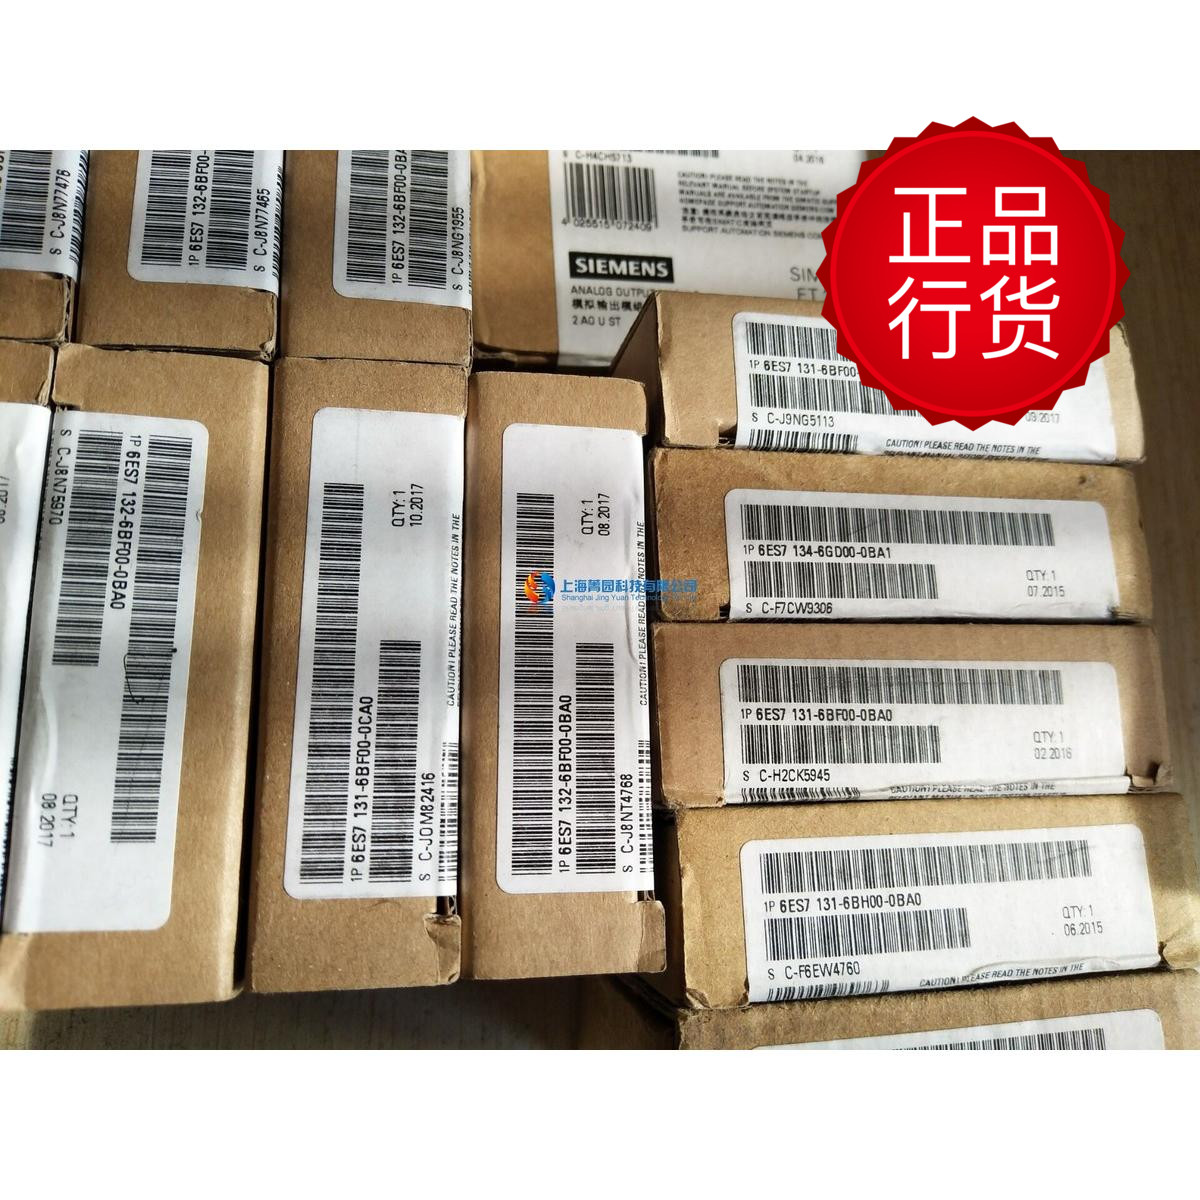 SIEMENS MVF461H40-20电磁阀传感器模块西门子电动执行器现货